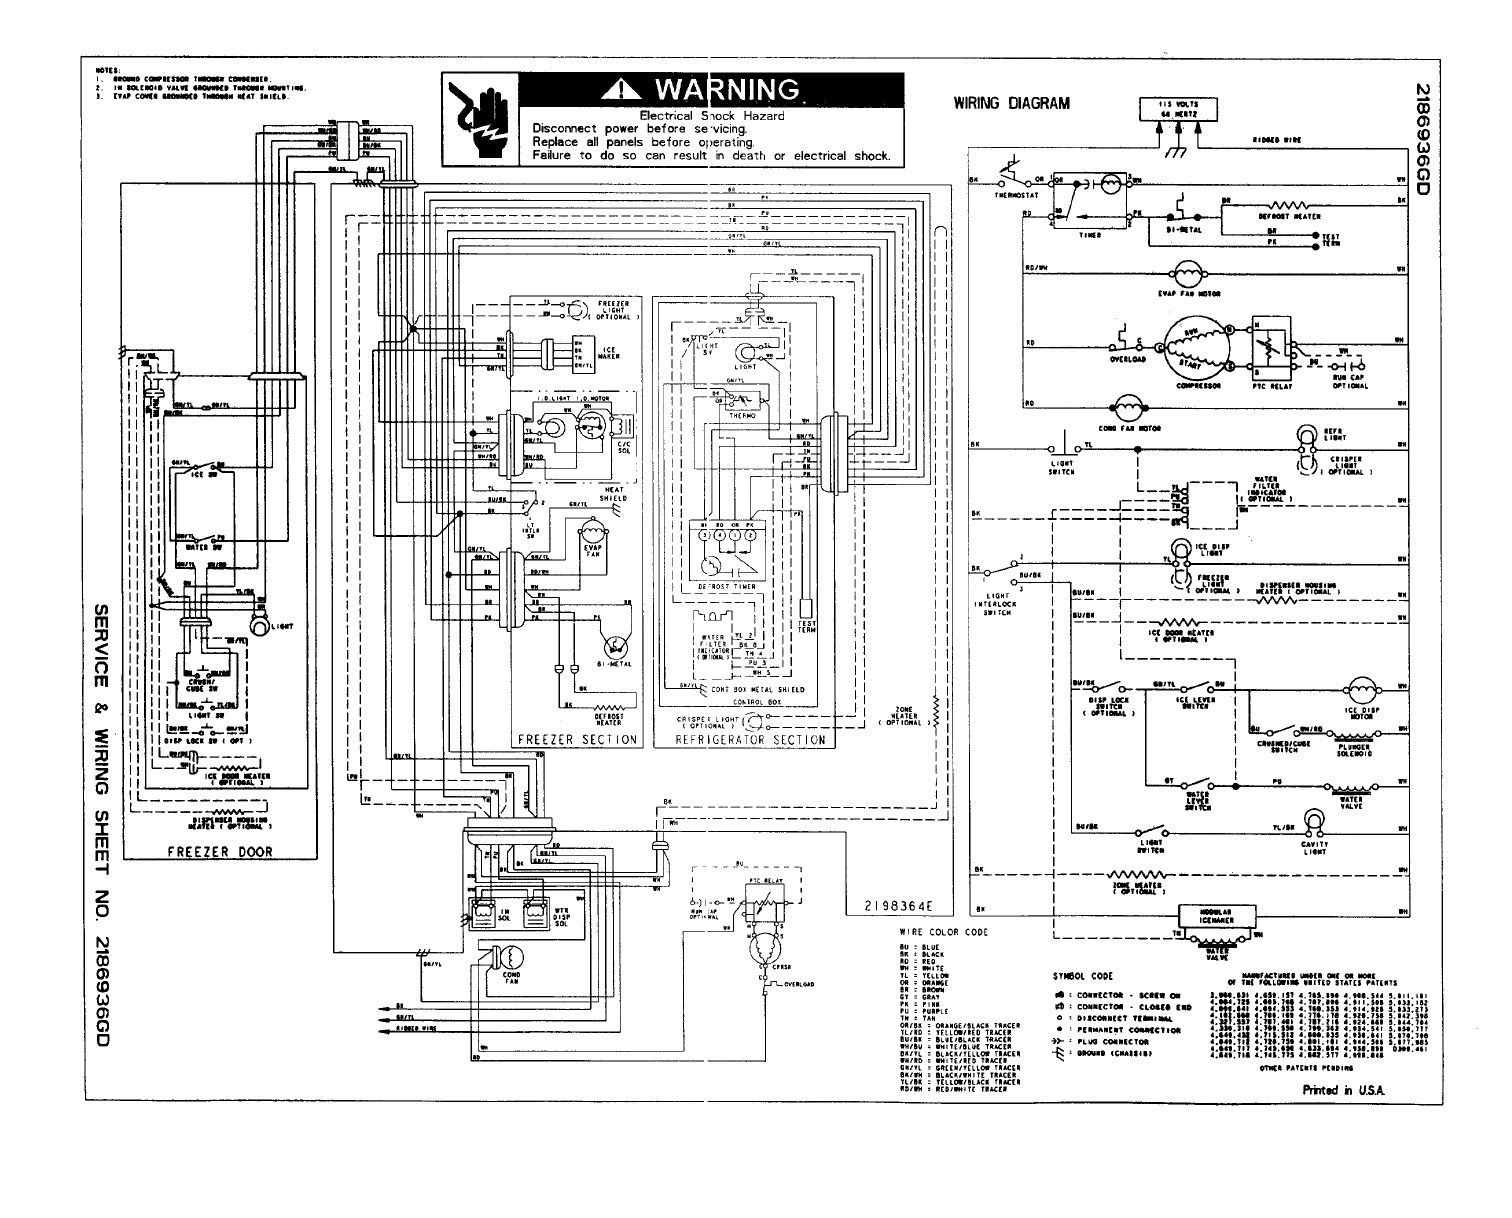 wiring diagram of refrigerator microsoft infrastructure kenmore download